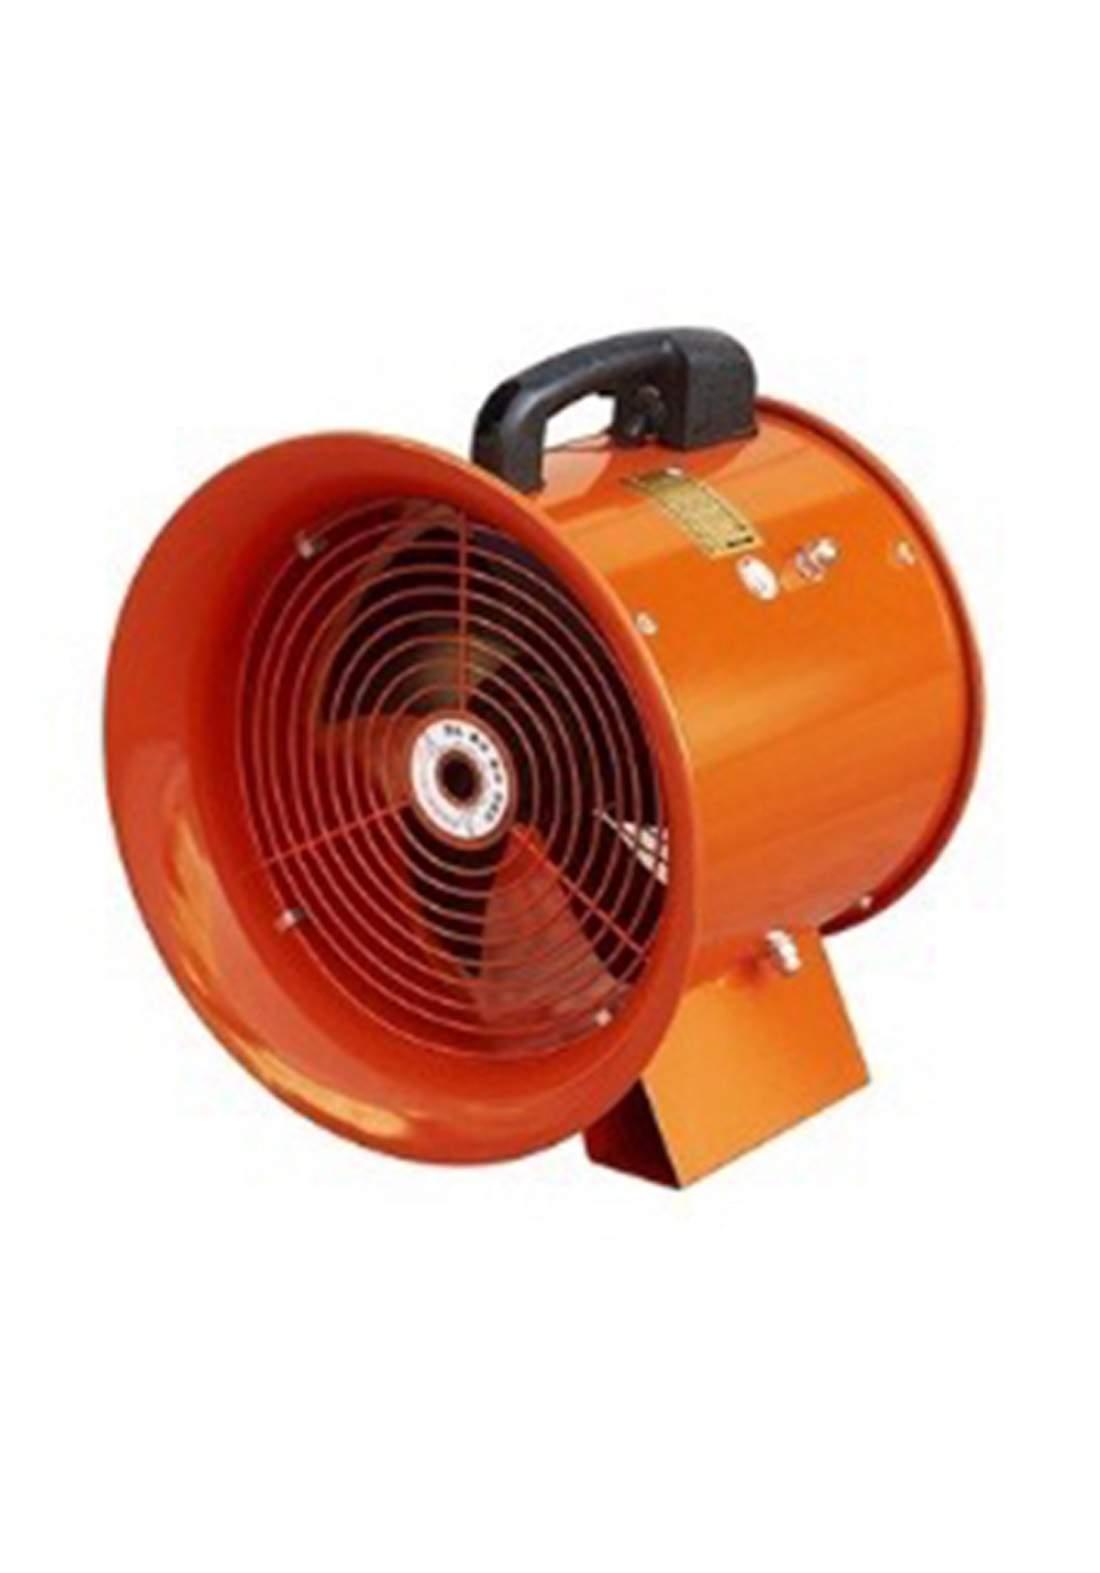 Subul AlHurra Ventilator Blower 16 inch مفرغة هواء